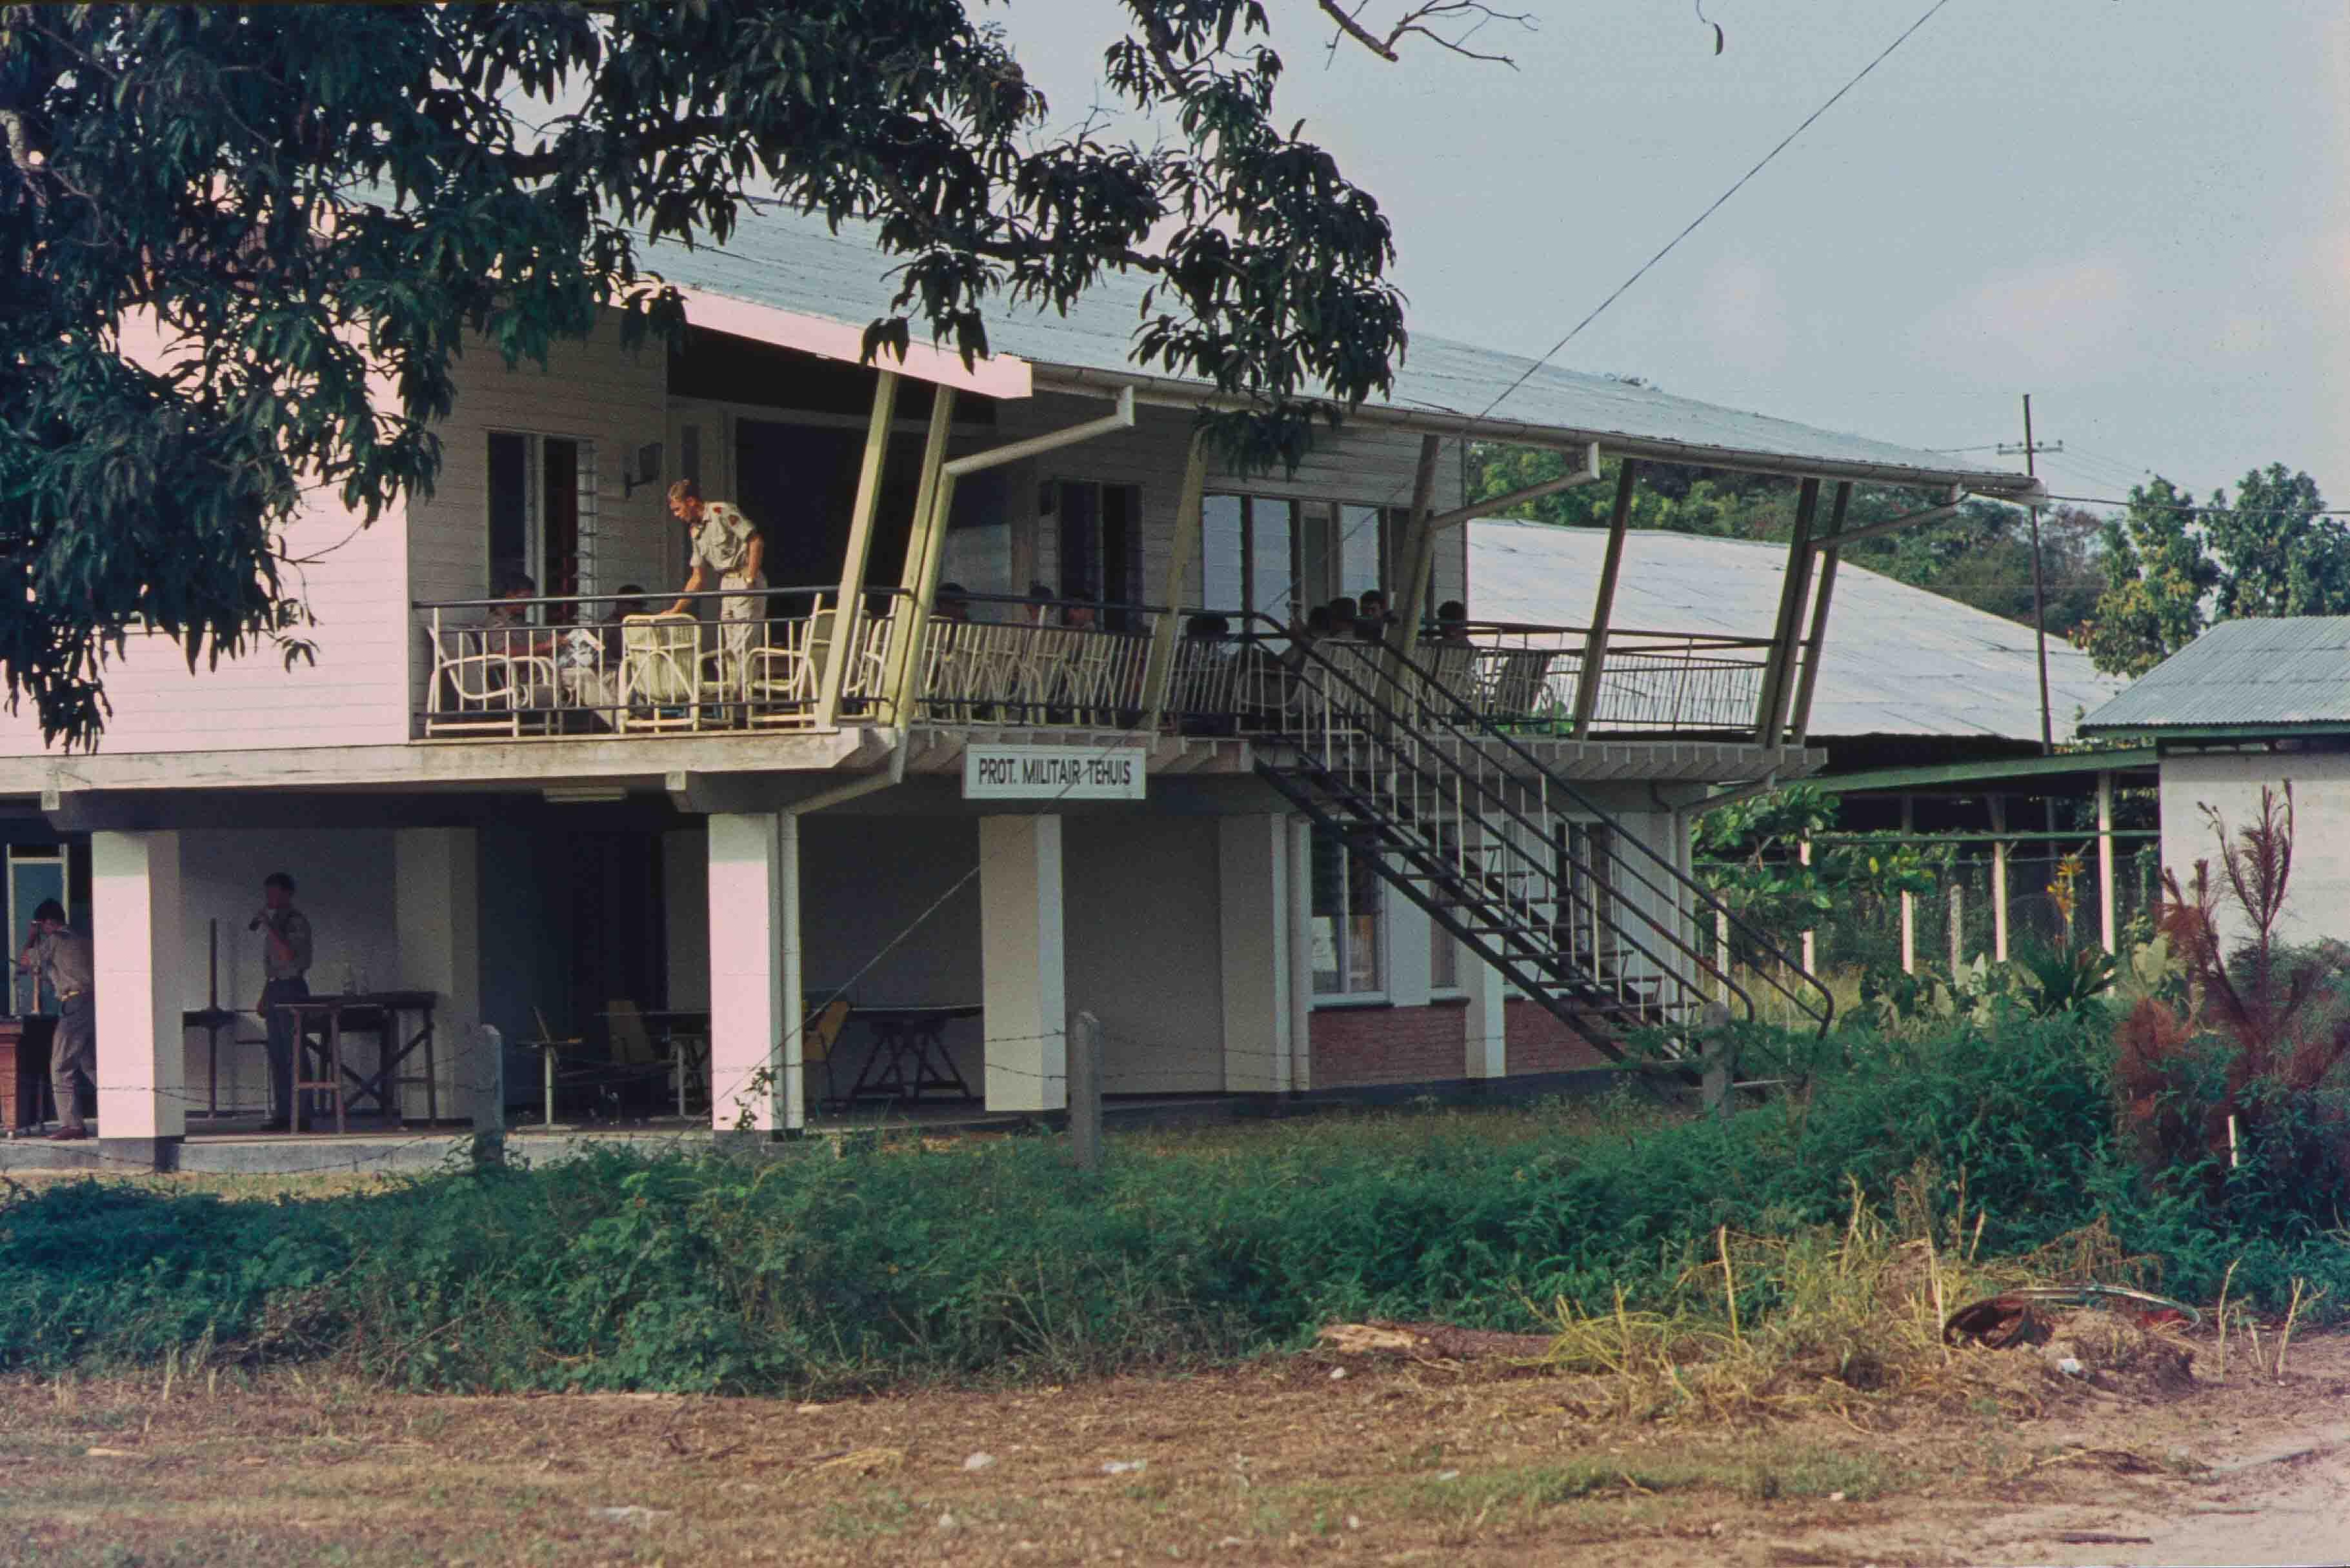 304. Suriname